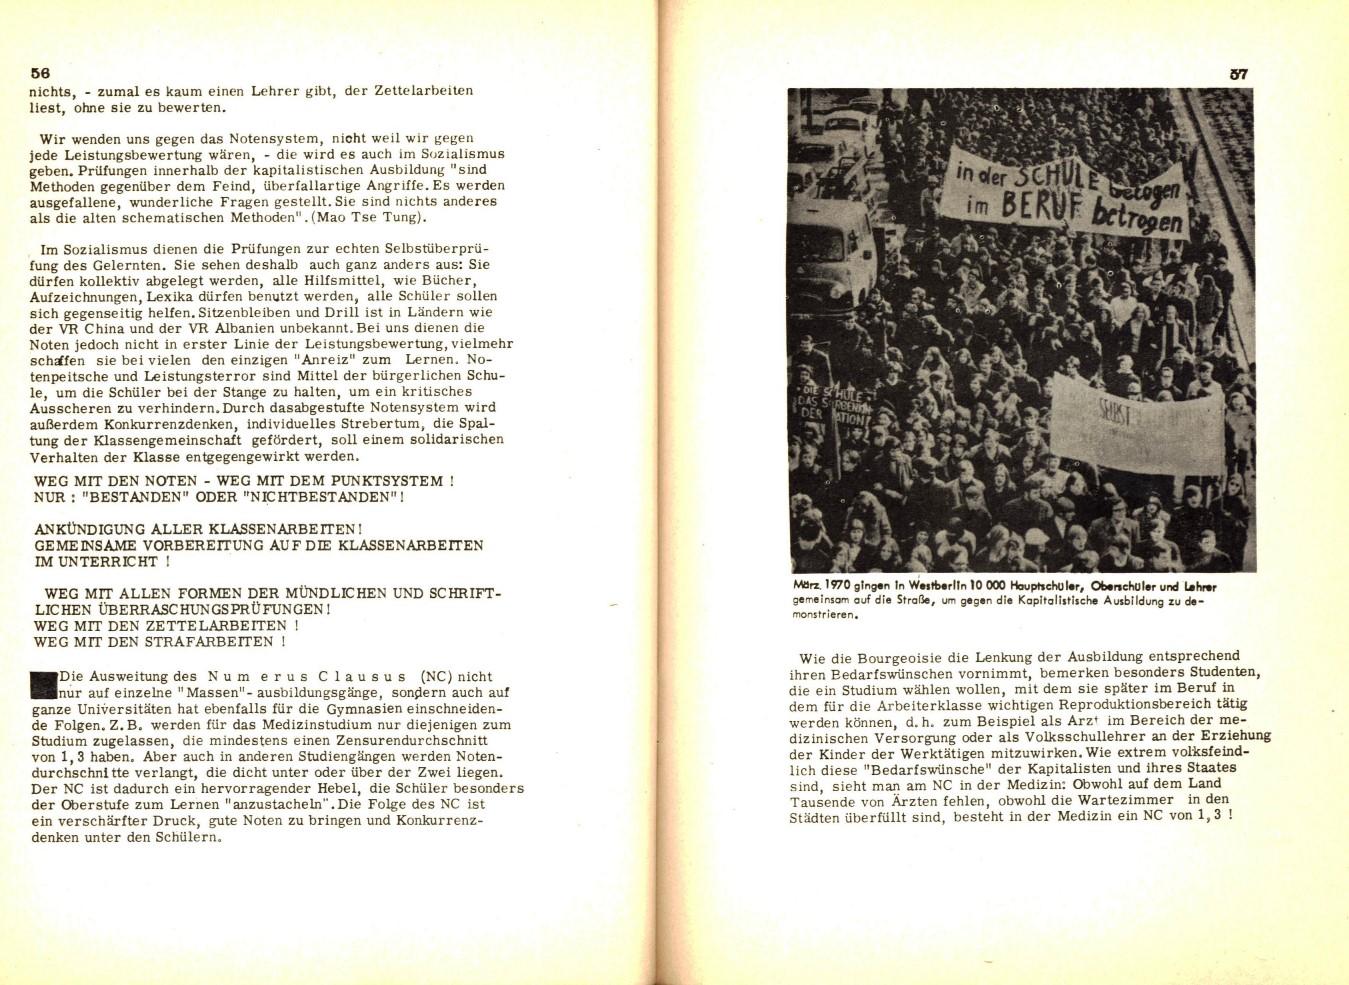 KOV_1973_Aktionsprogramm_31